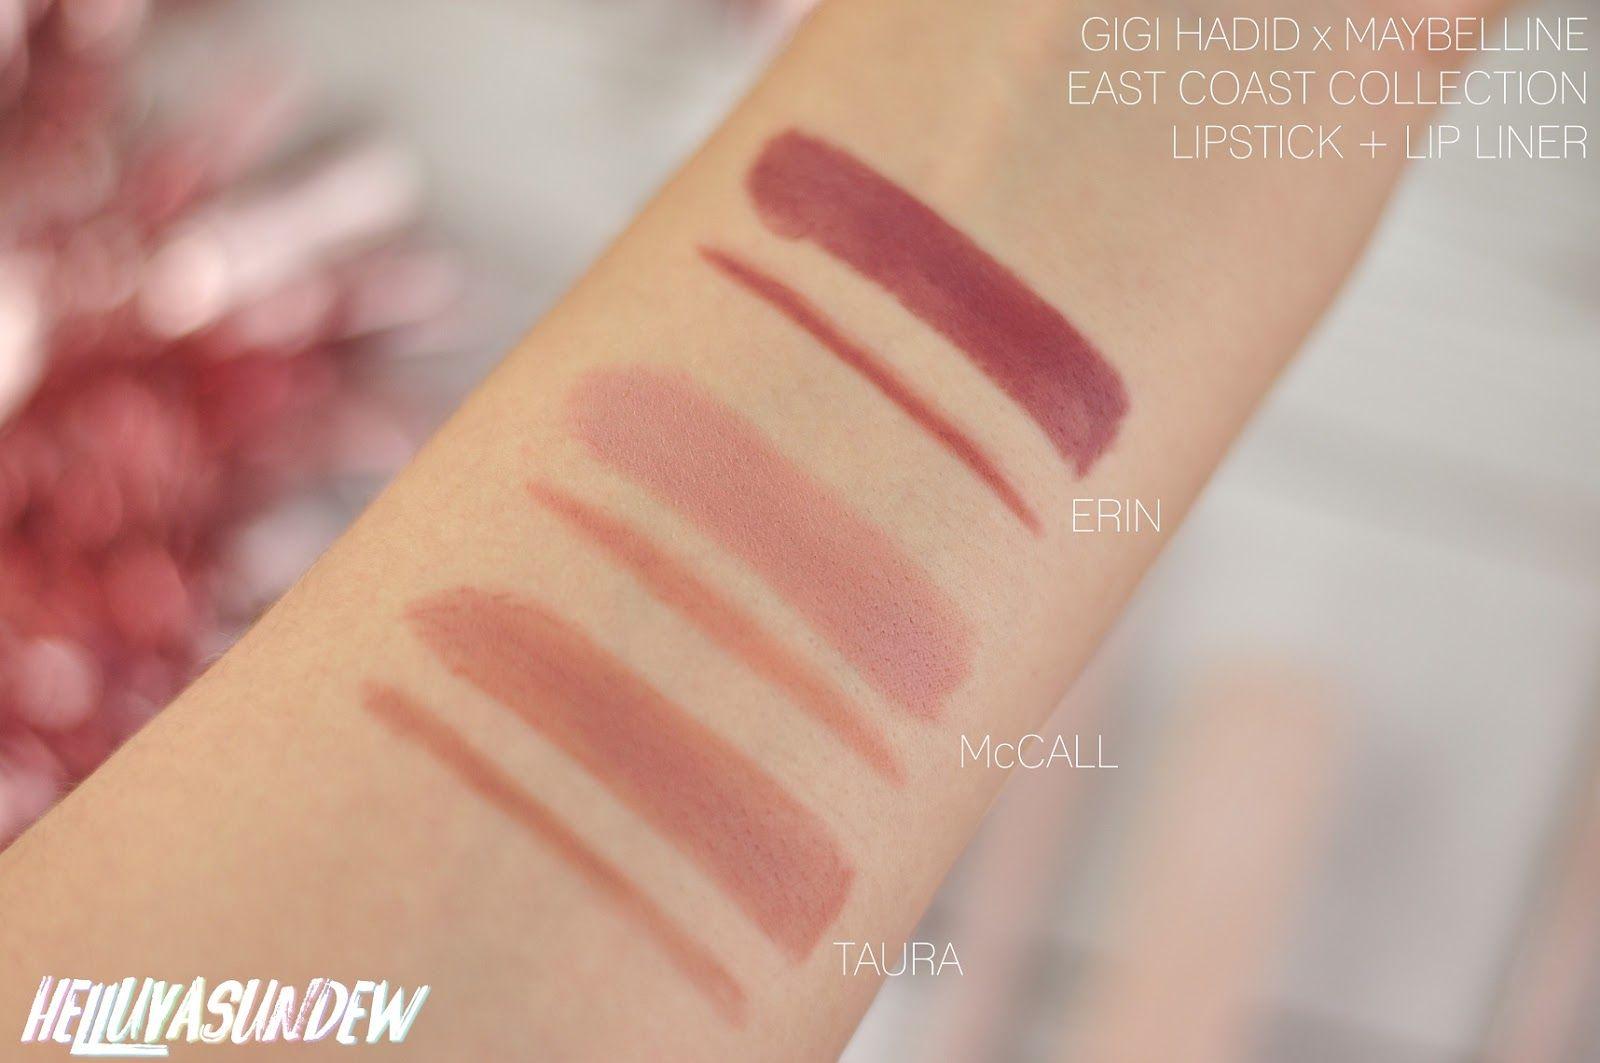 Gigi Hadid X Maybelline East Coast Lipstick Kits Review Taura